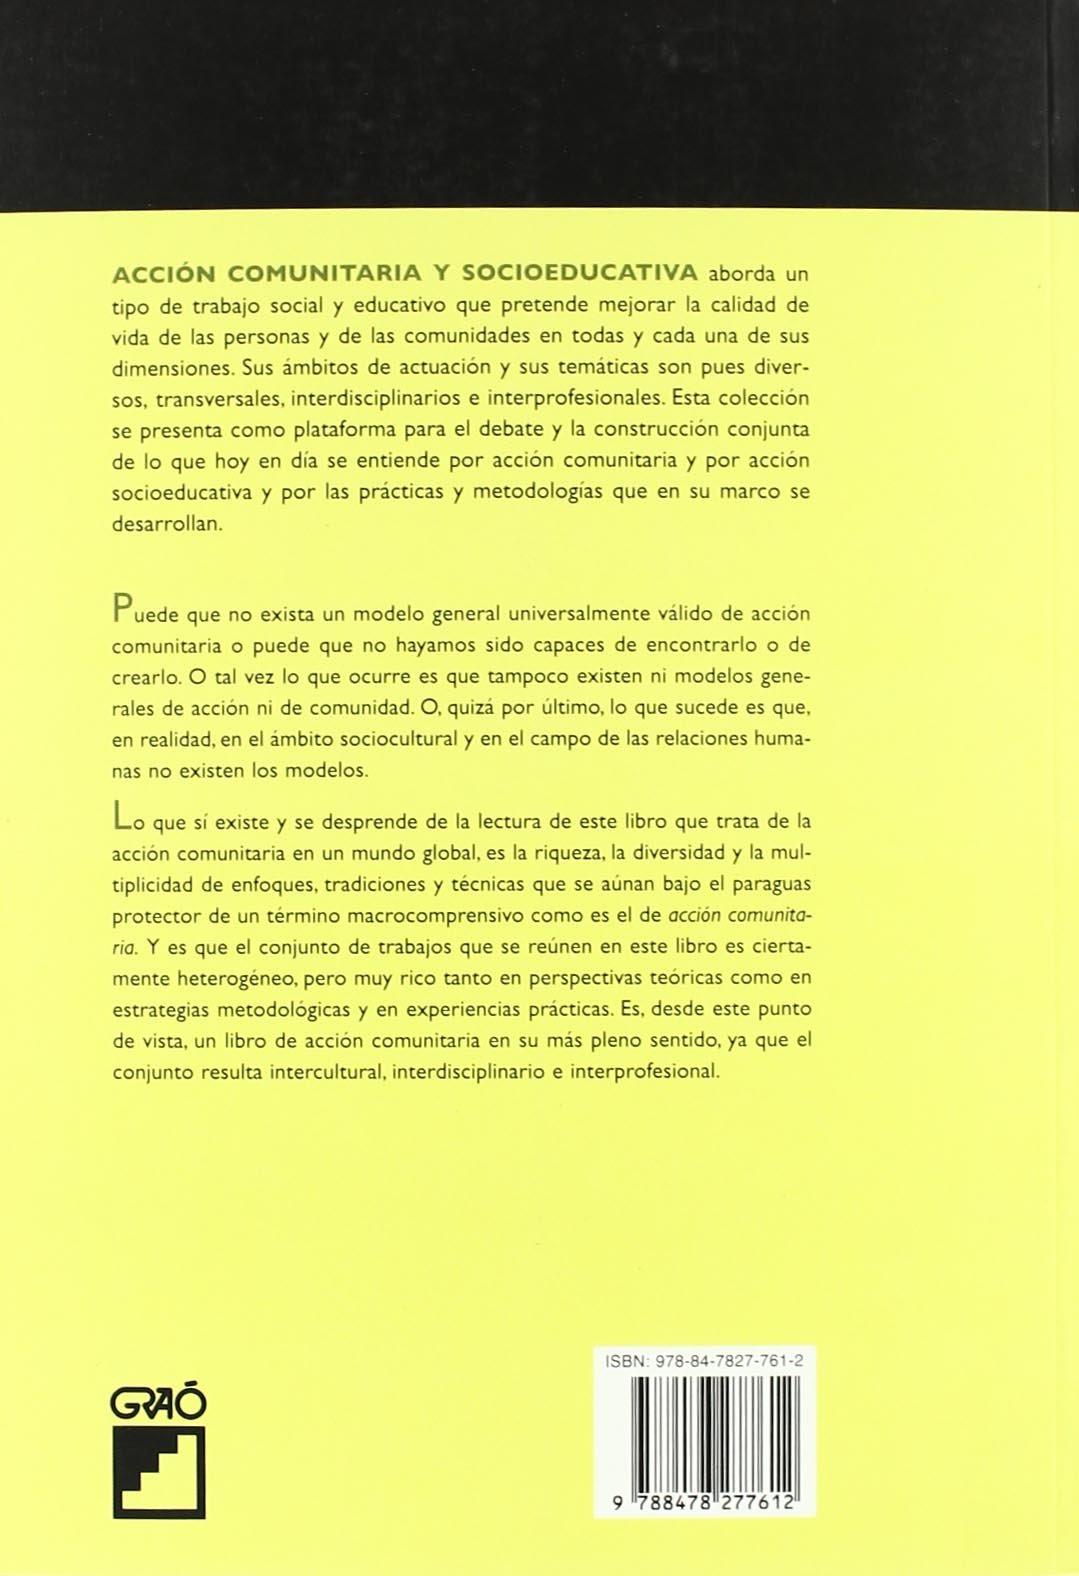 ... Estados Unidos de América y Brasil (Spanish Edition): Xavier Úcar, Tânia Baraúna, Barry Checkoway, Melvin Delgado, Edmundo de Drummond Alves Jr., ...